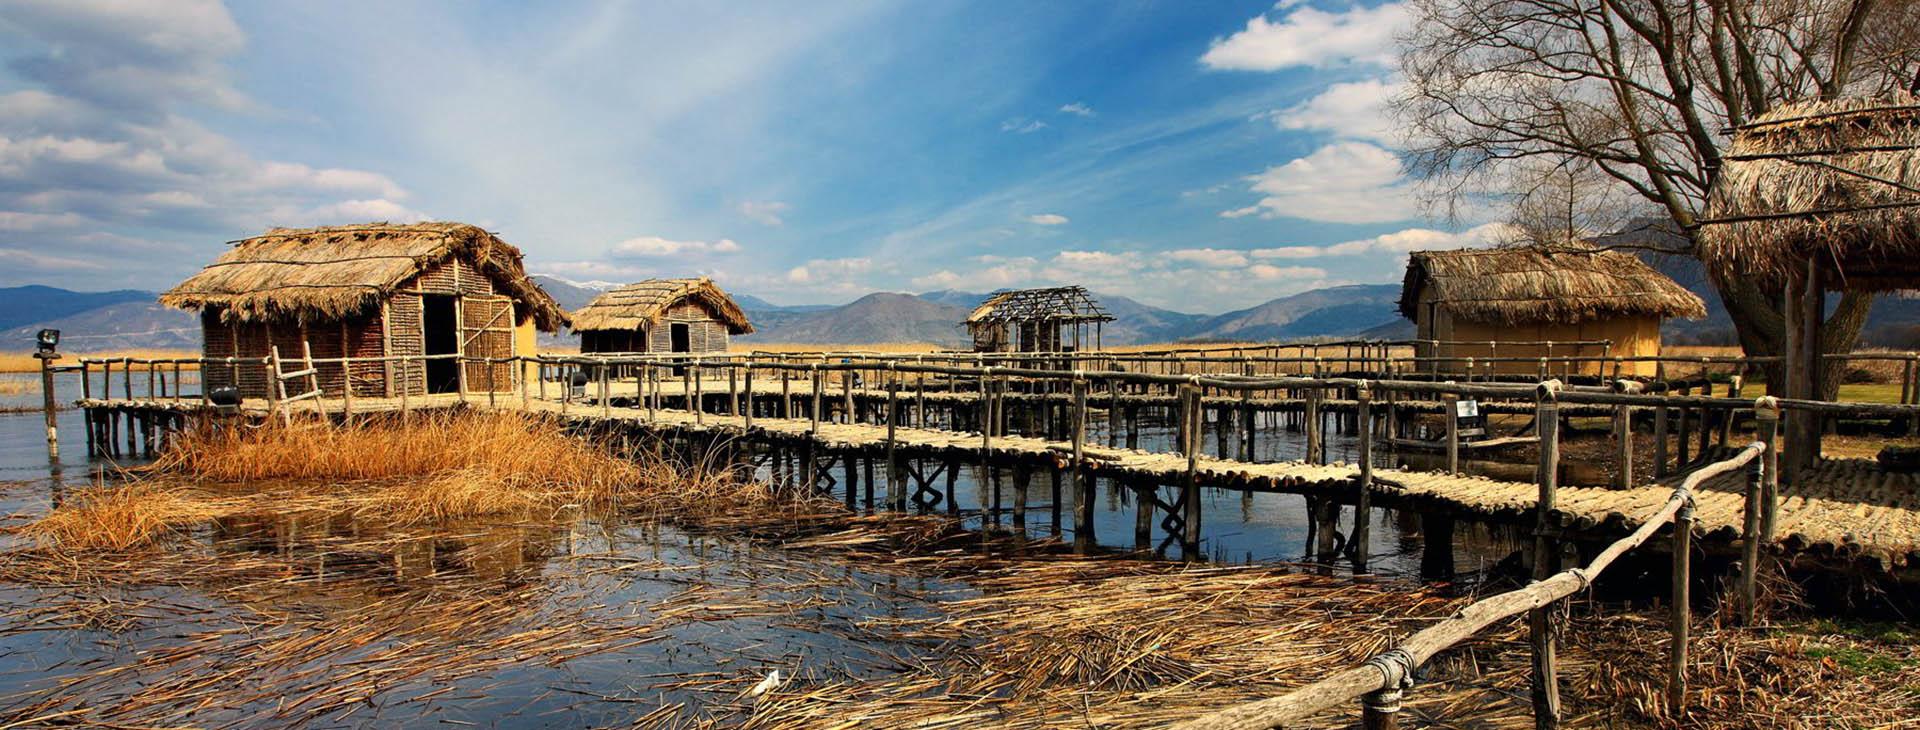 Prehistoric lakeside settlement Dispilio, Kastoria lake